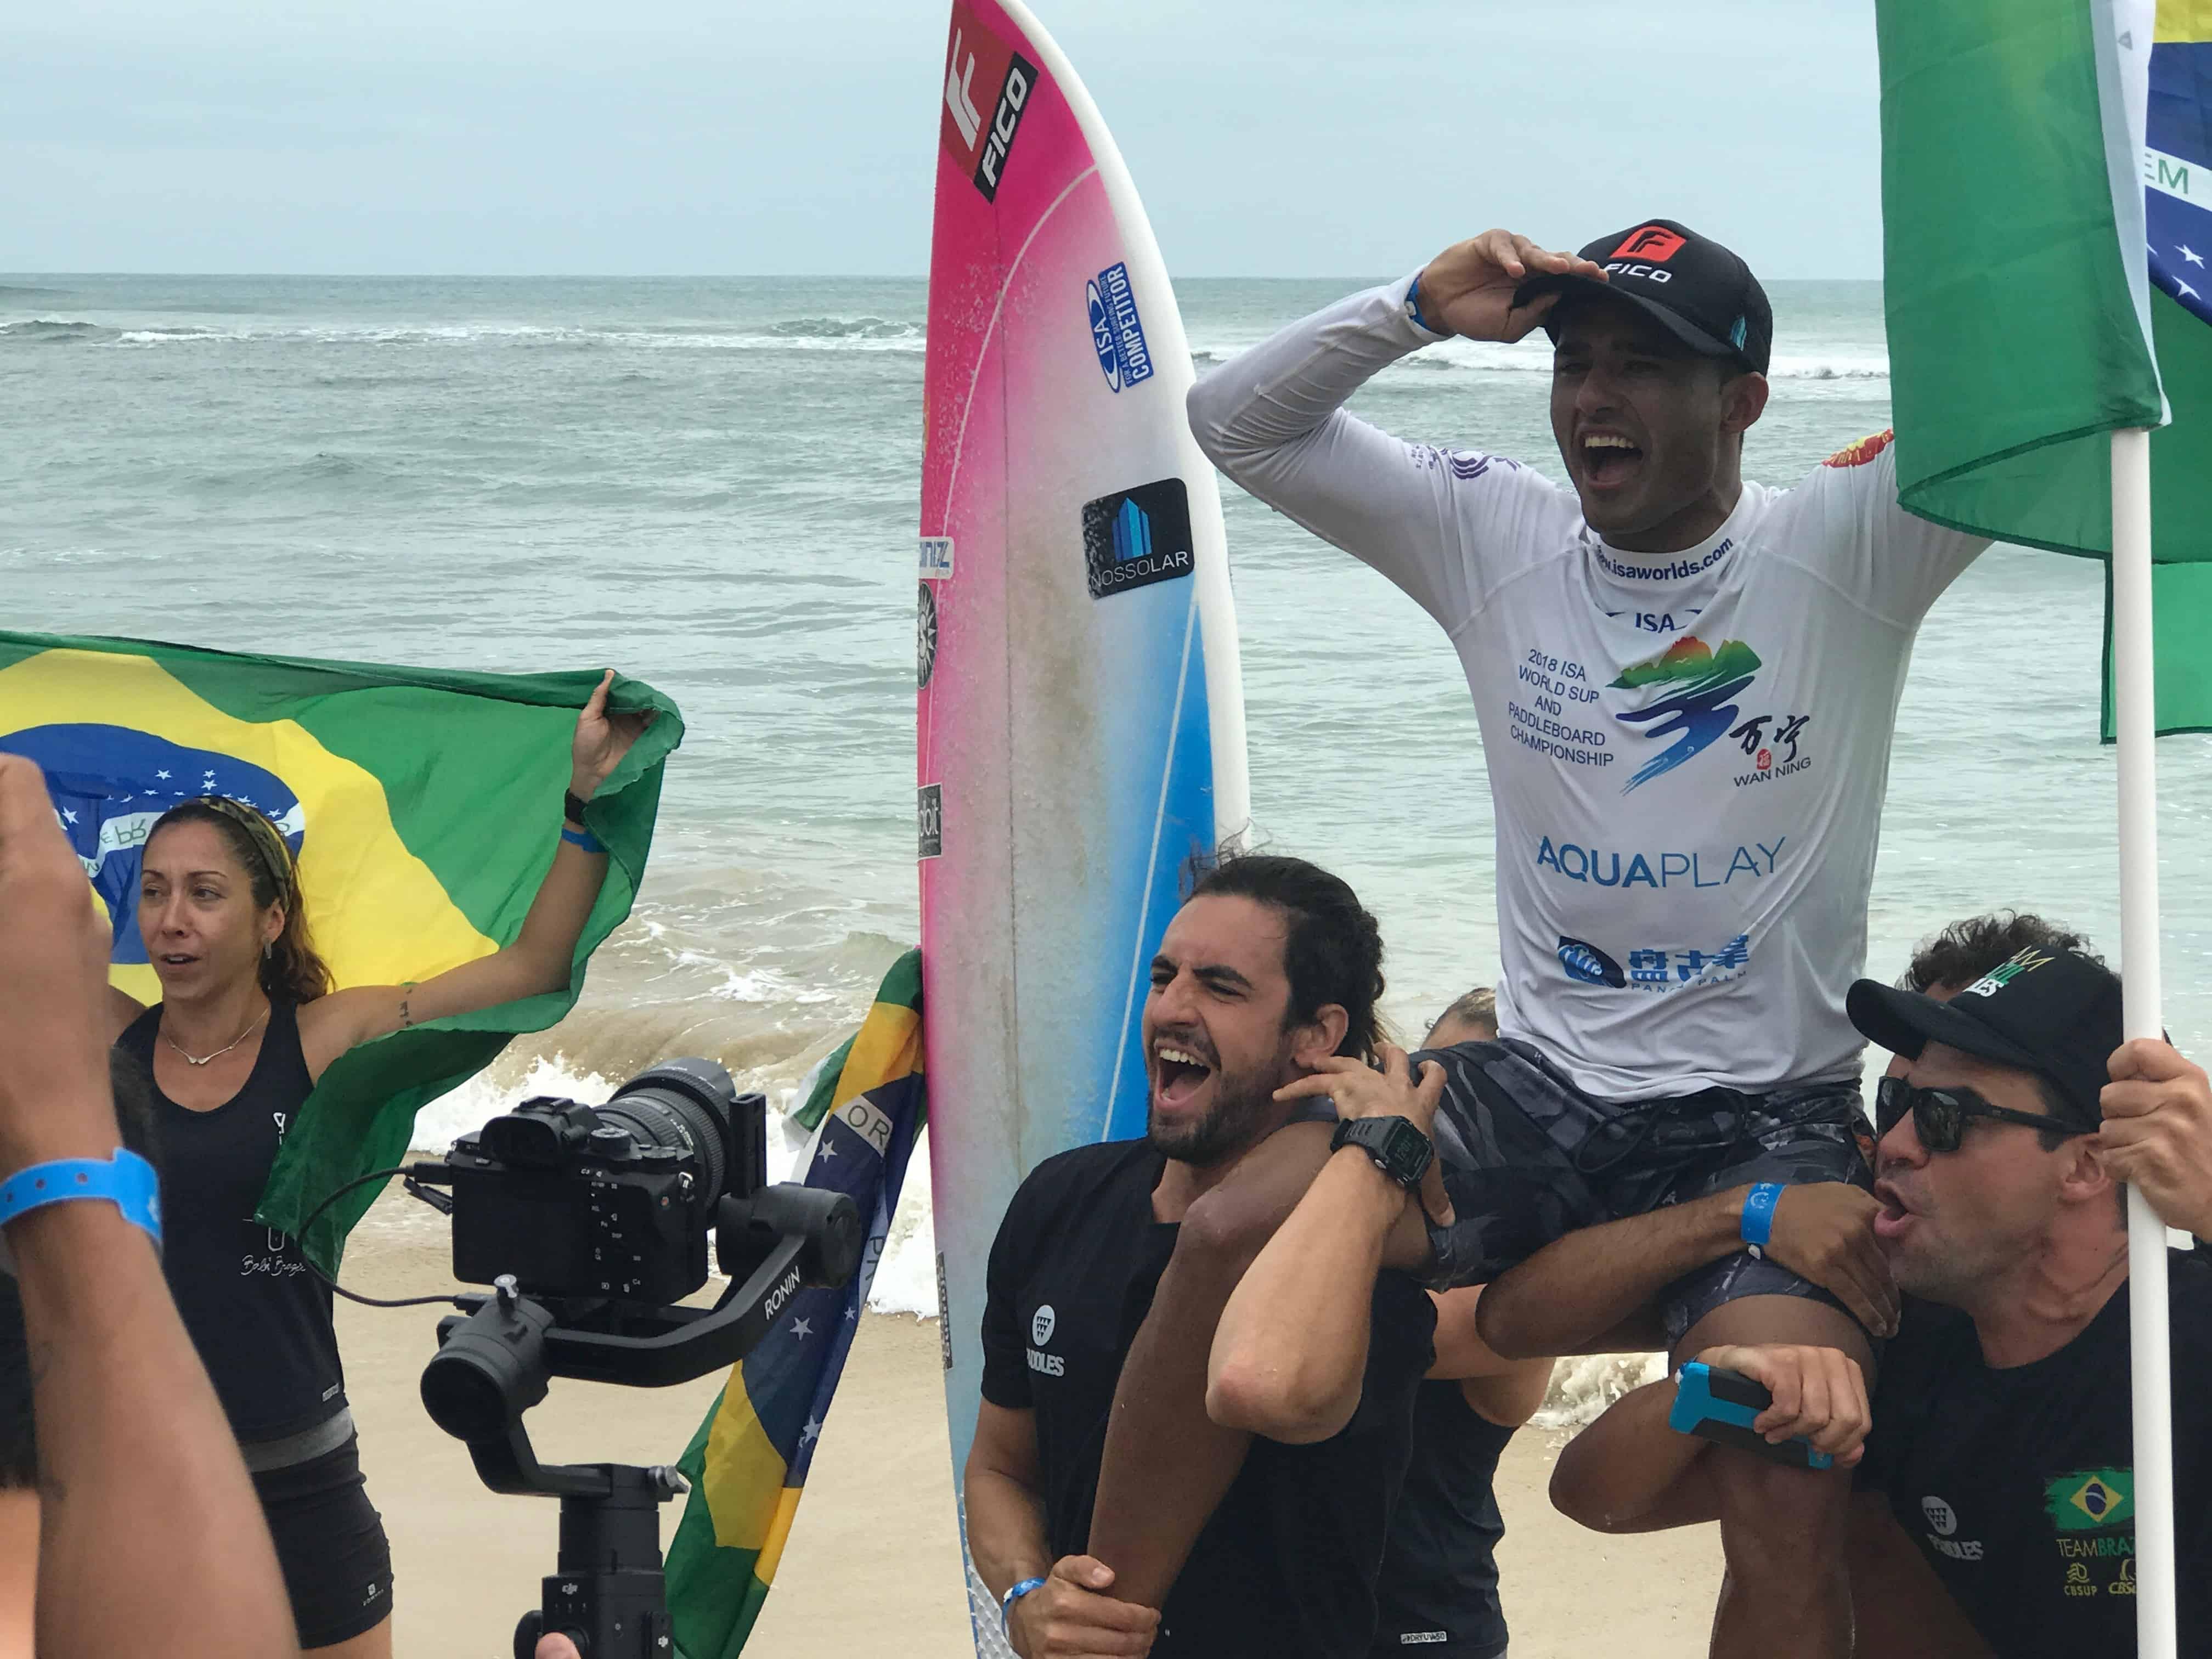 Luiz Diniz, world champion SUP surfer from Brazil